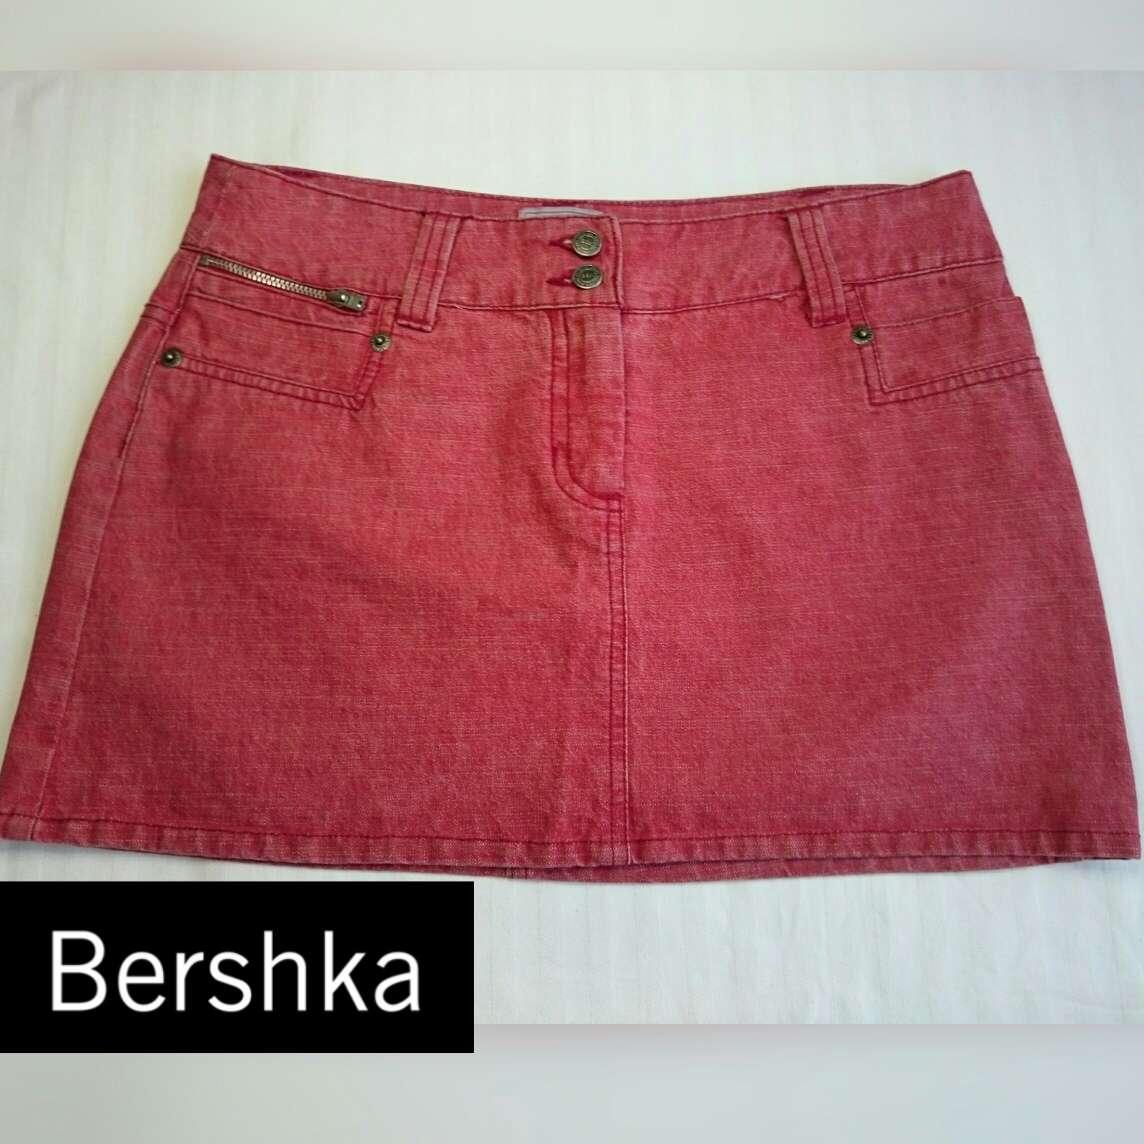 Imagen Minifalda roja vintage